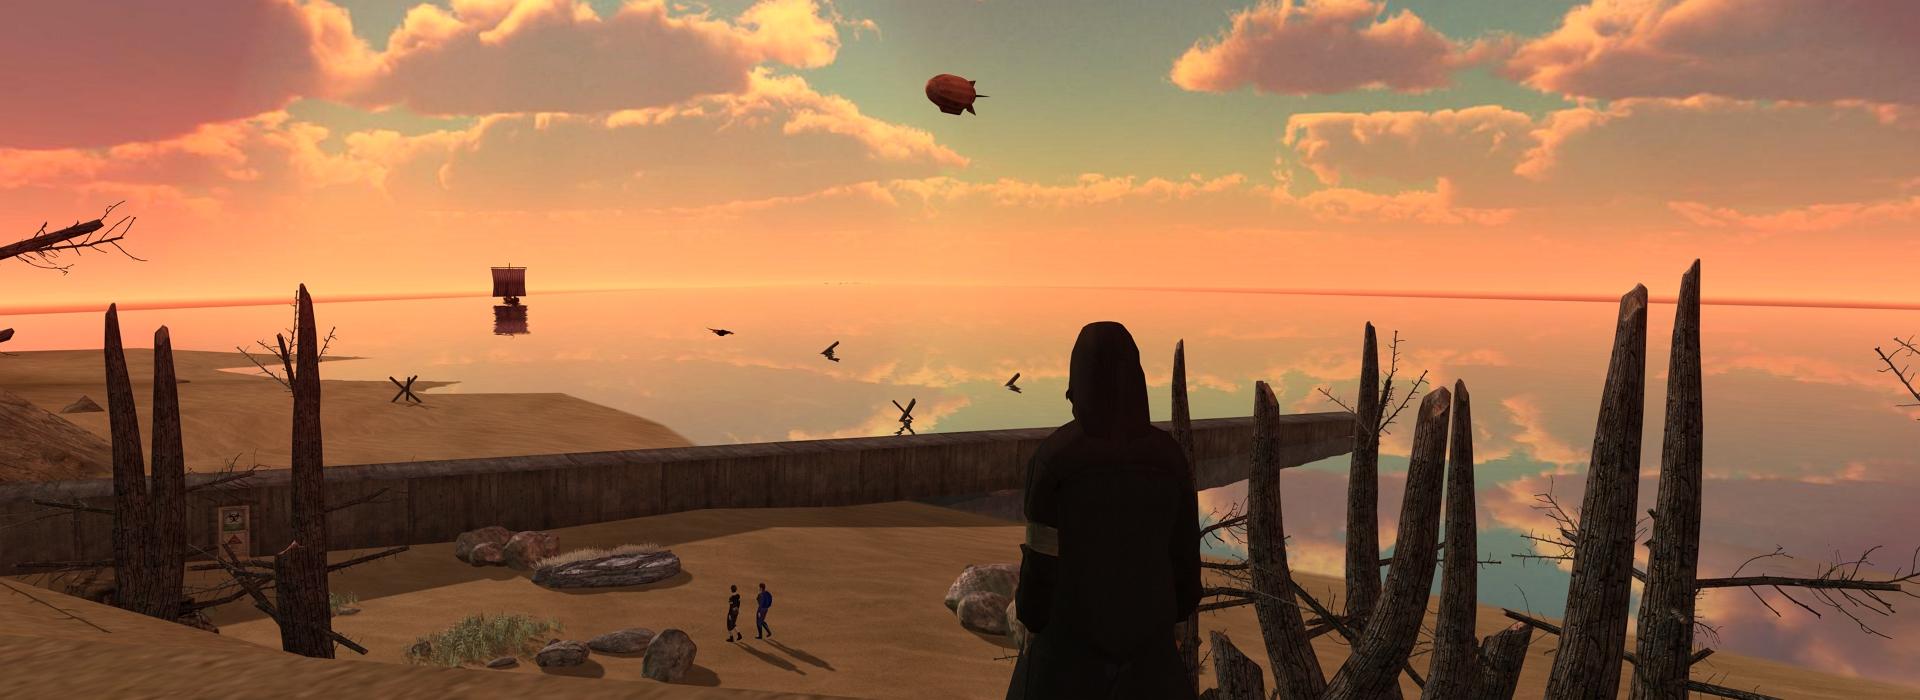 http://virtualrealist.com/images/iclone/banners/khentopia_1.jpg